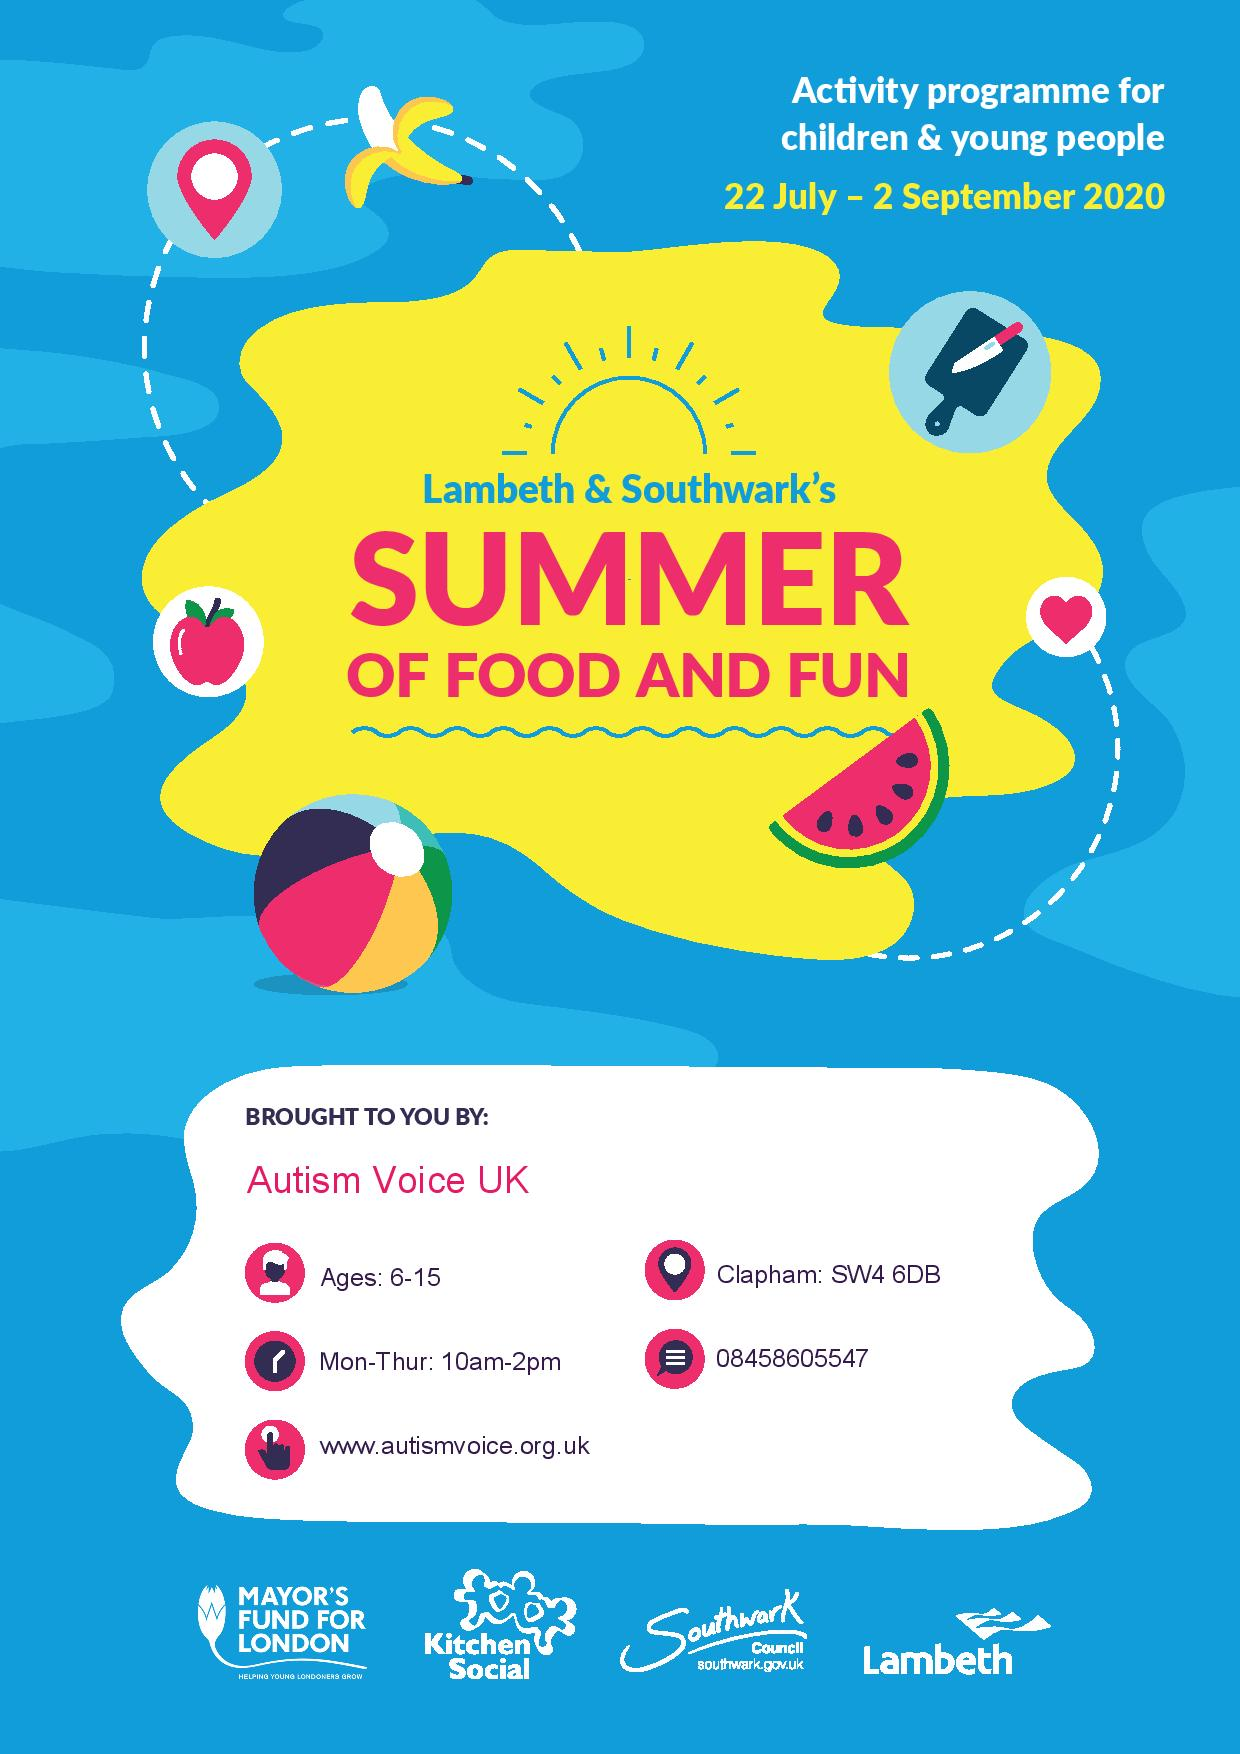 Lambeth & Southwark's Summer Of Food And Fun